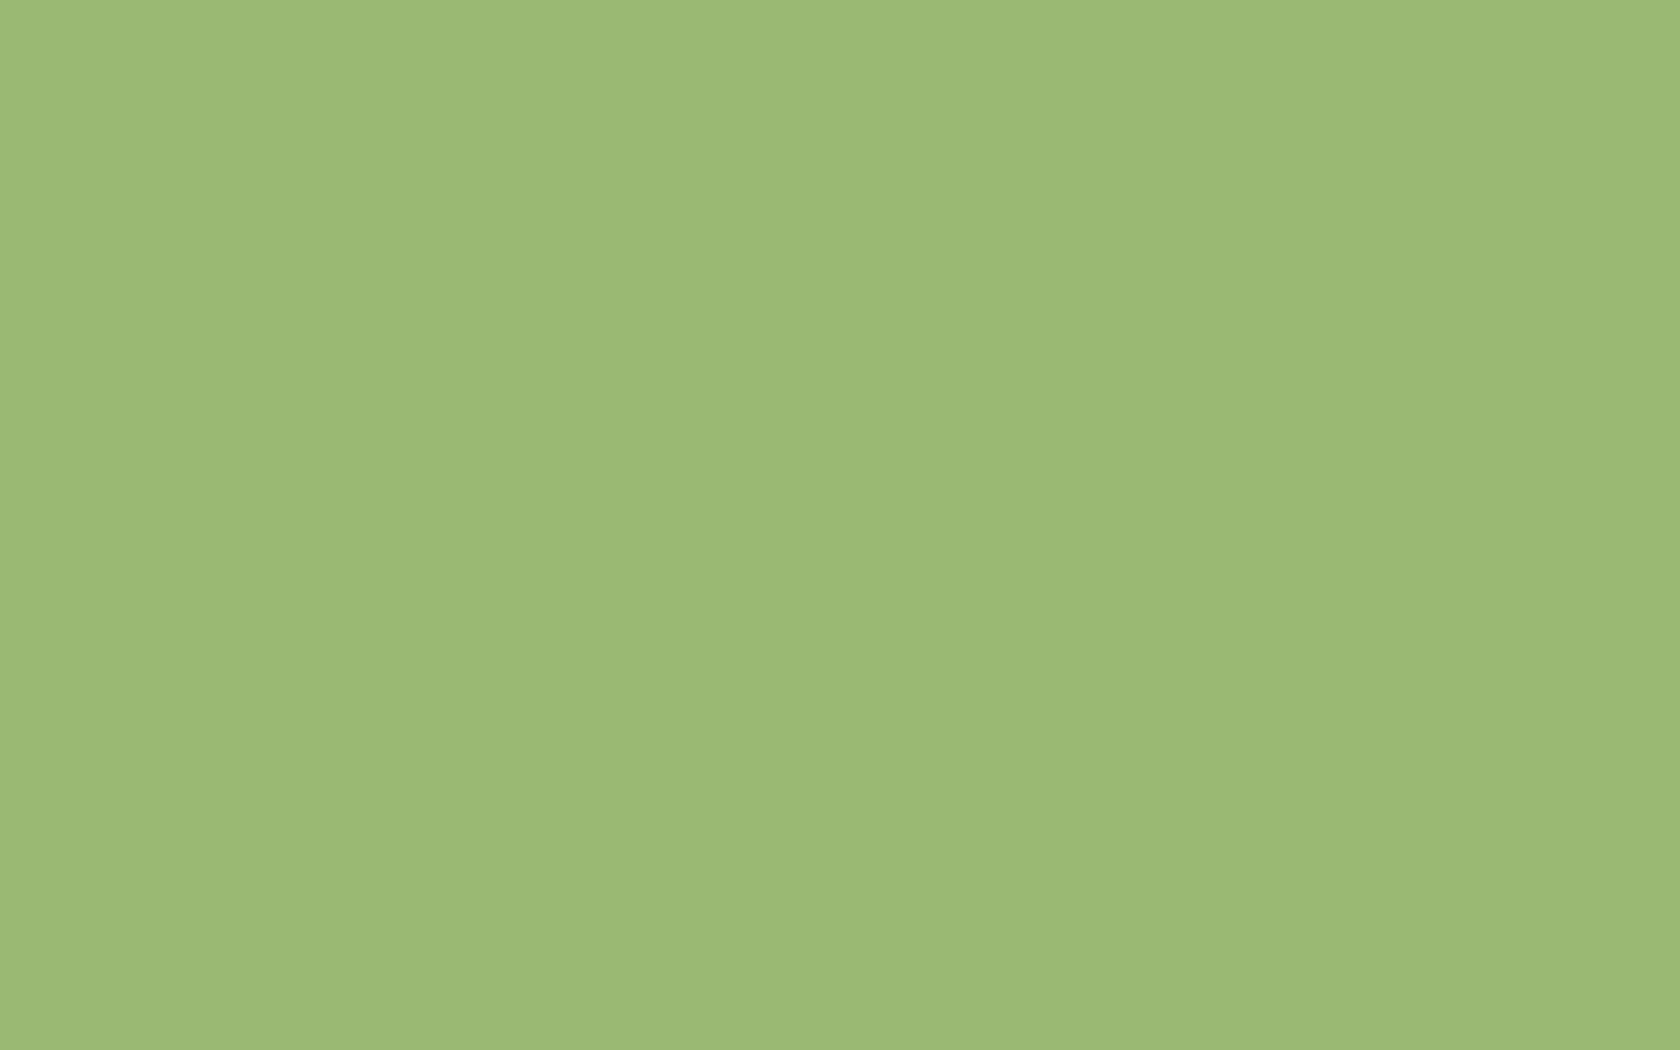 1680x1050 Olivine Solid Color Background